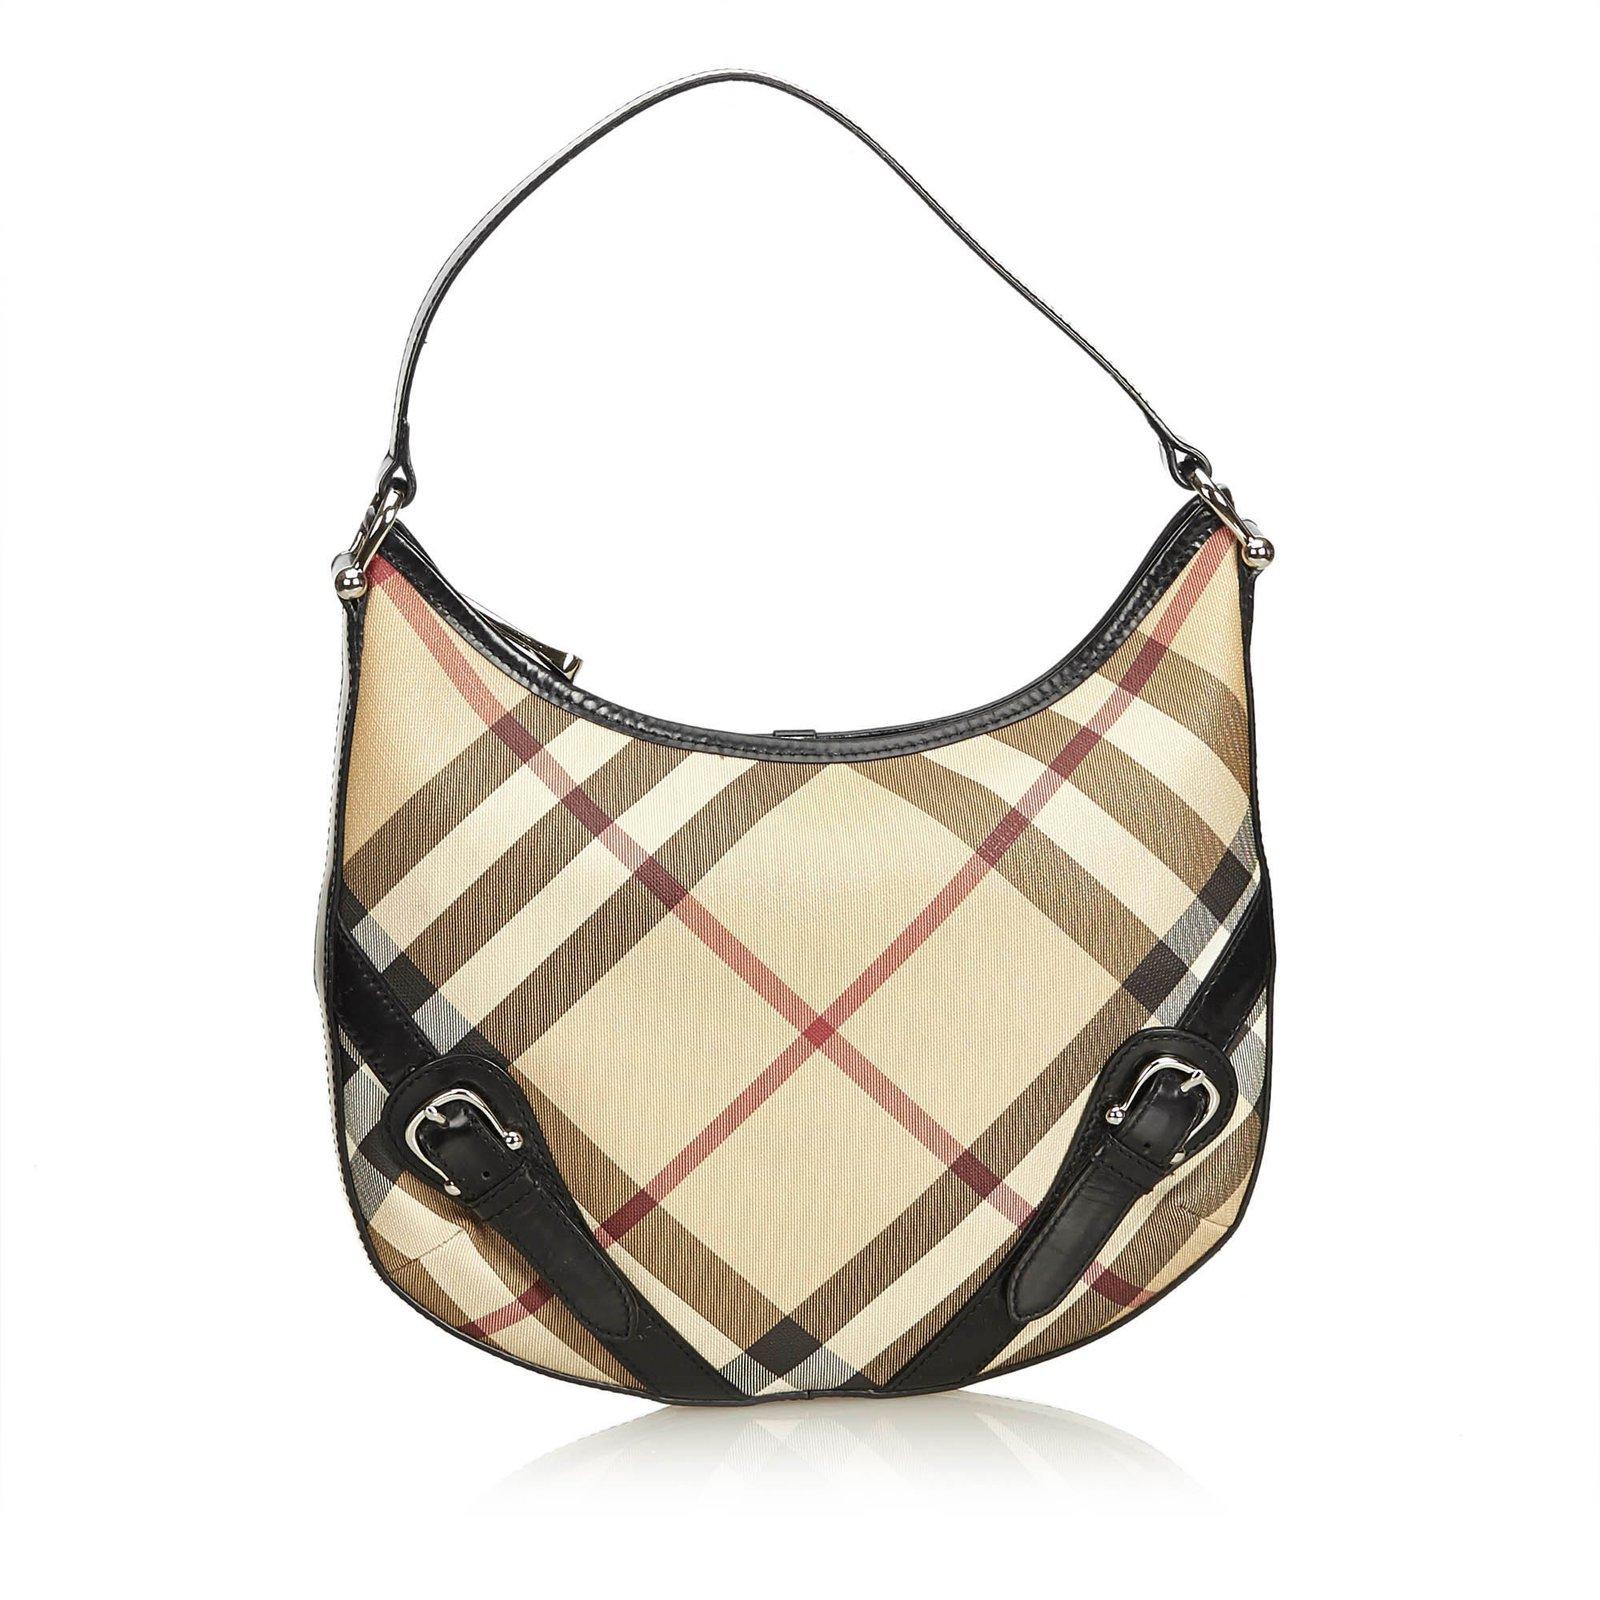 18f4f60f6a61 Burberry Nova Check Hobo Bag Handbags Leather